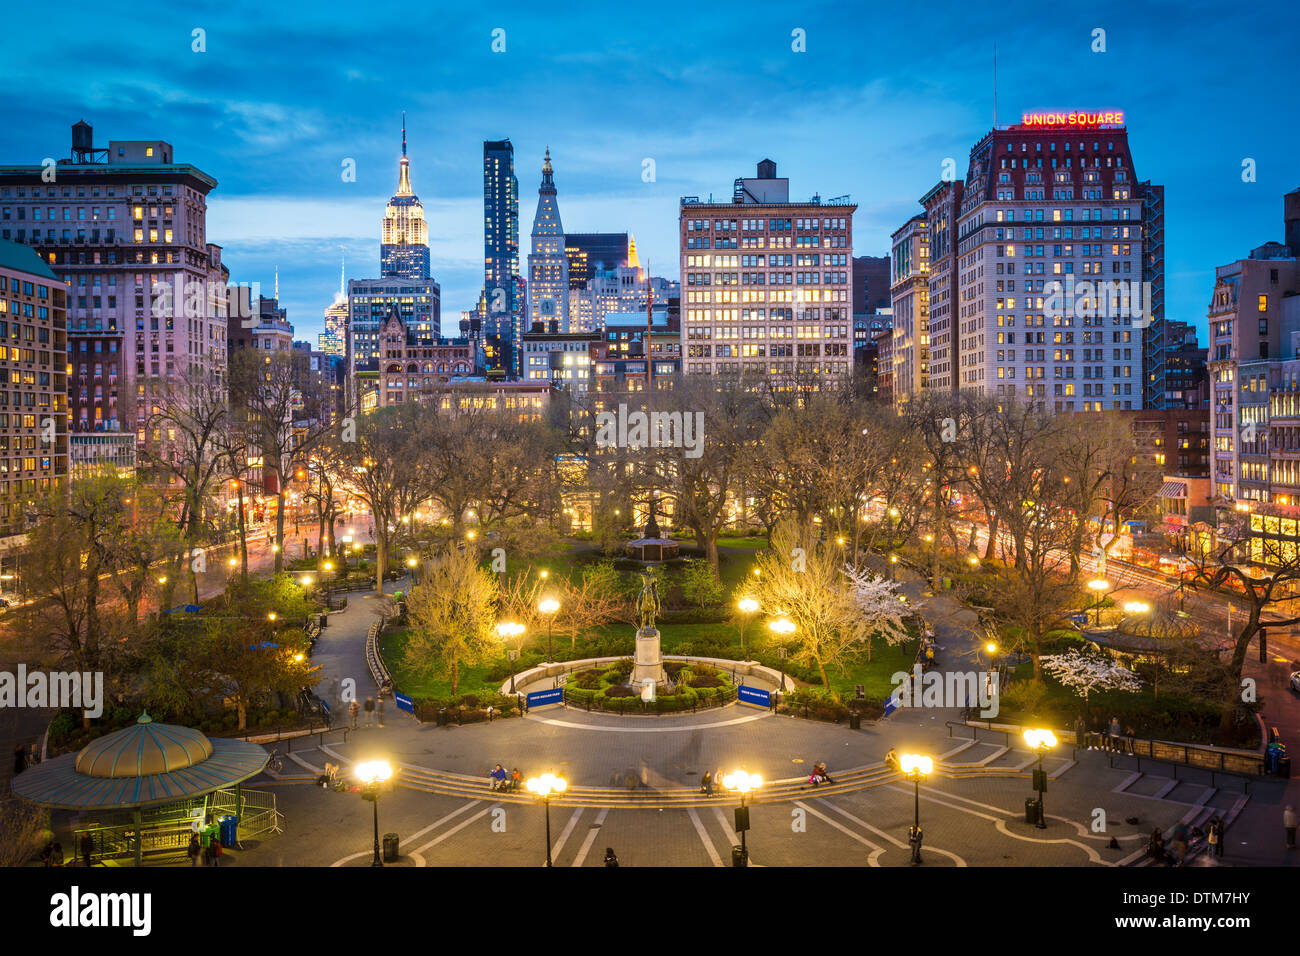 New York City am Union Square in Manhattan. Stockbild